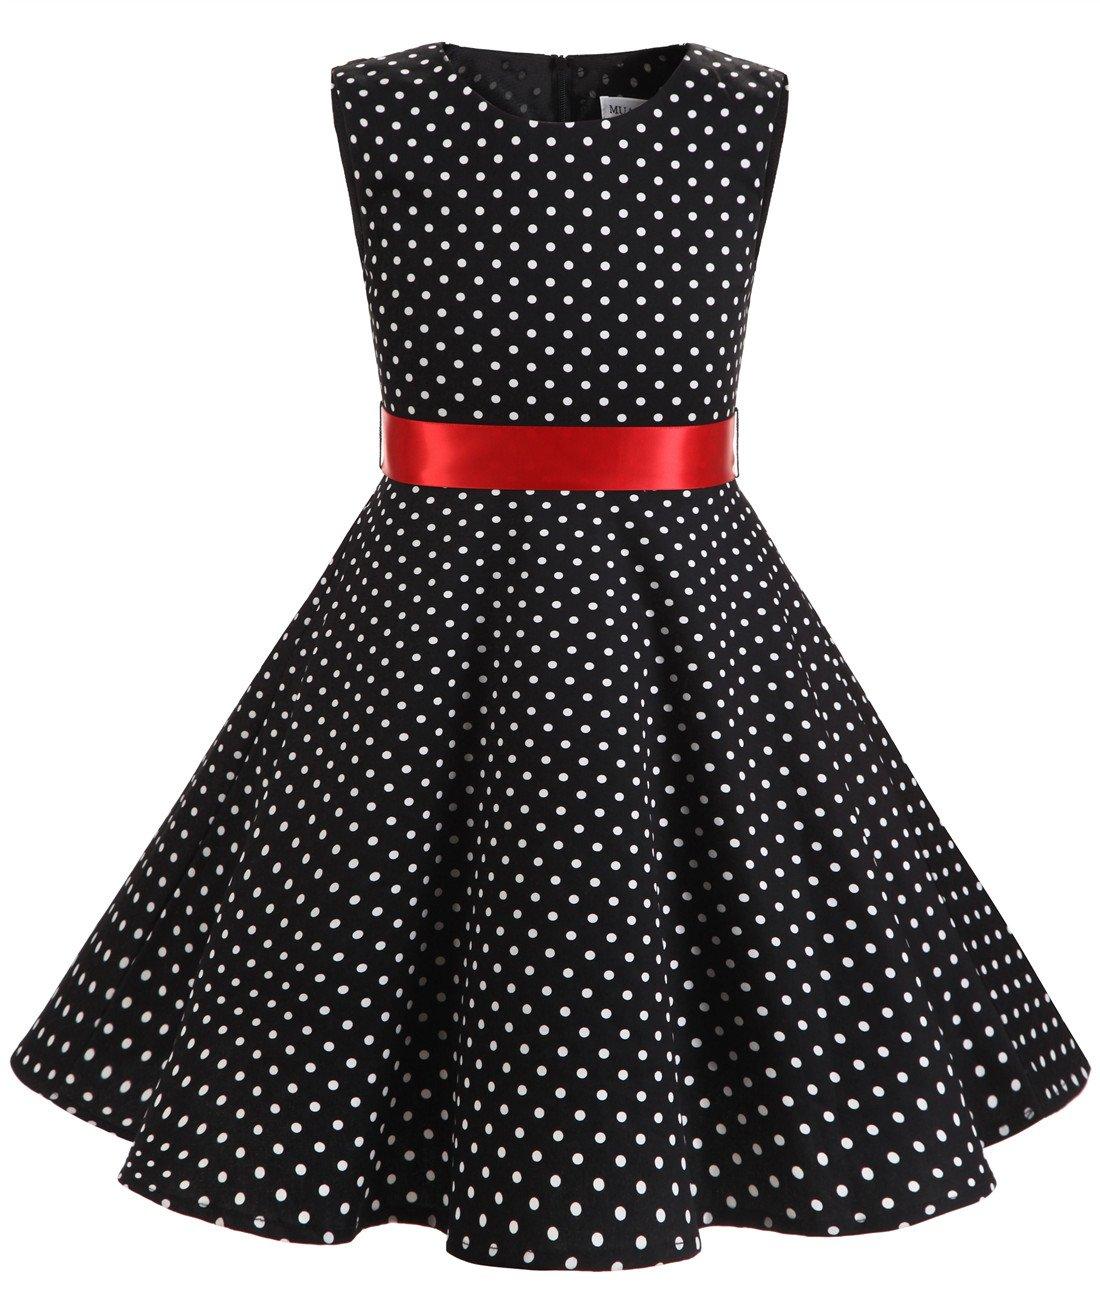 MUADRESS Girls Sleeveless O-Neck Audrey 1950s Vintage Swing Princess Easter Party Dress BlackSmallWhiteDot M